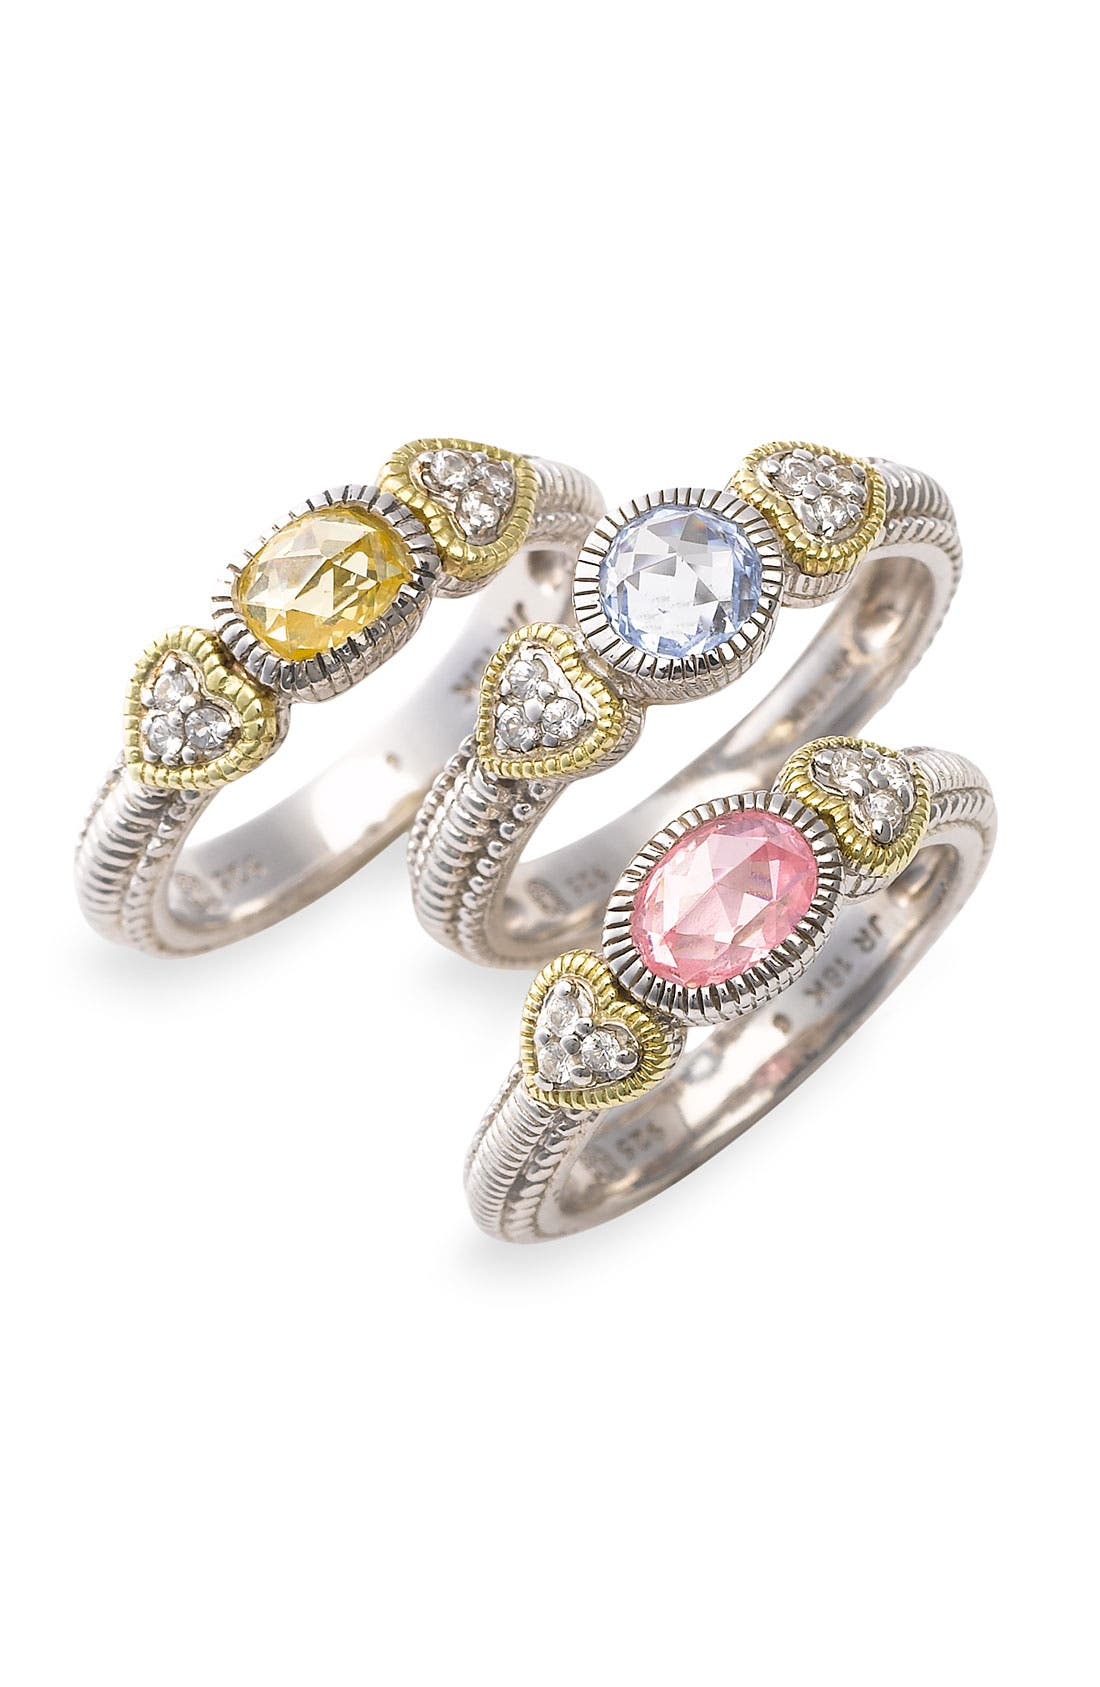 Alternate Image 1 Selected - Judith Ripka 'Ambrosia' Semiprecious Ring